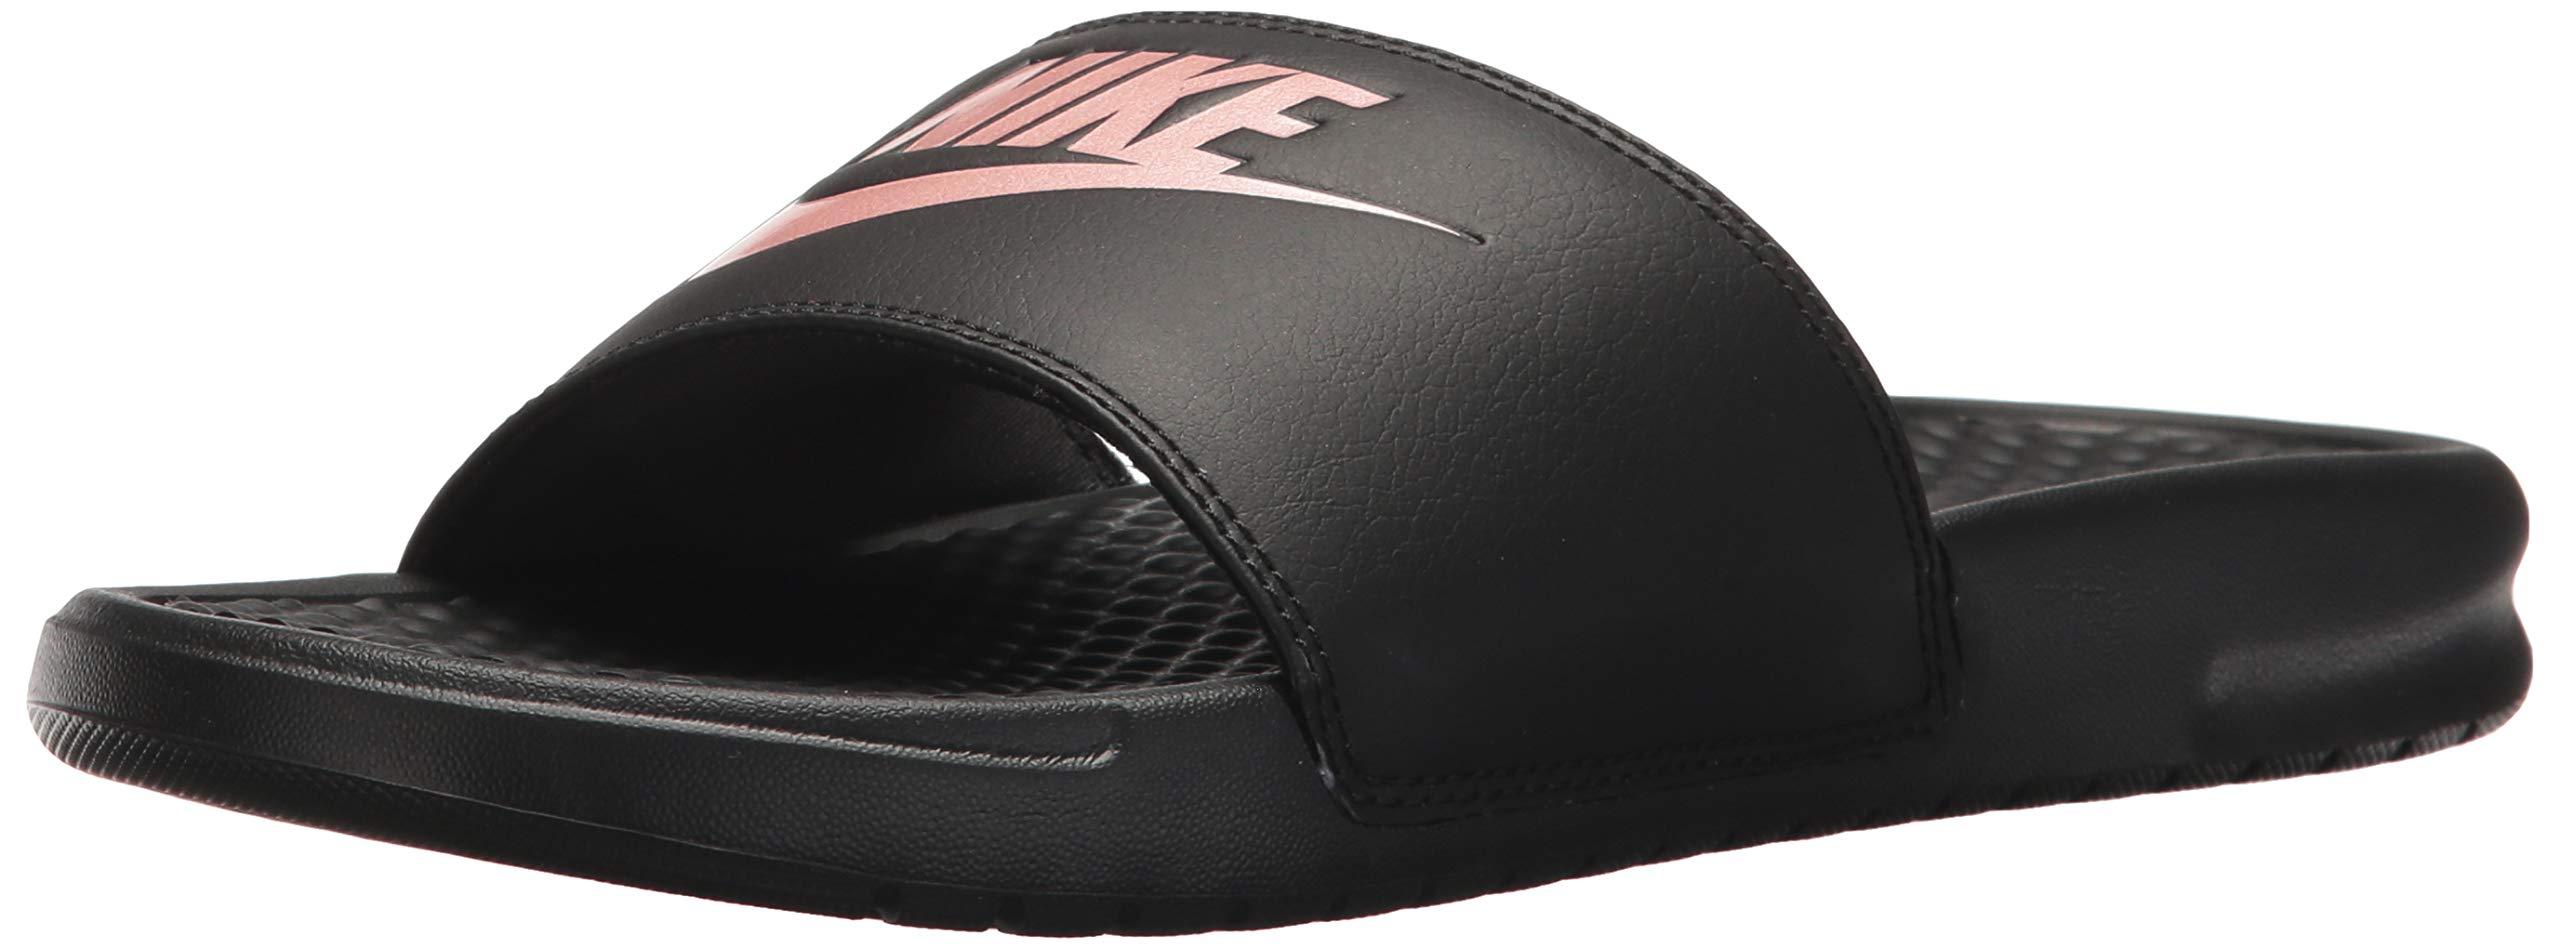 Nike Women's Benassi Just Do It Sandal, Black/Rose Gold, 8 Regular US by Nike